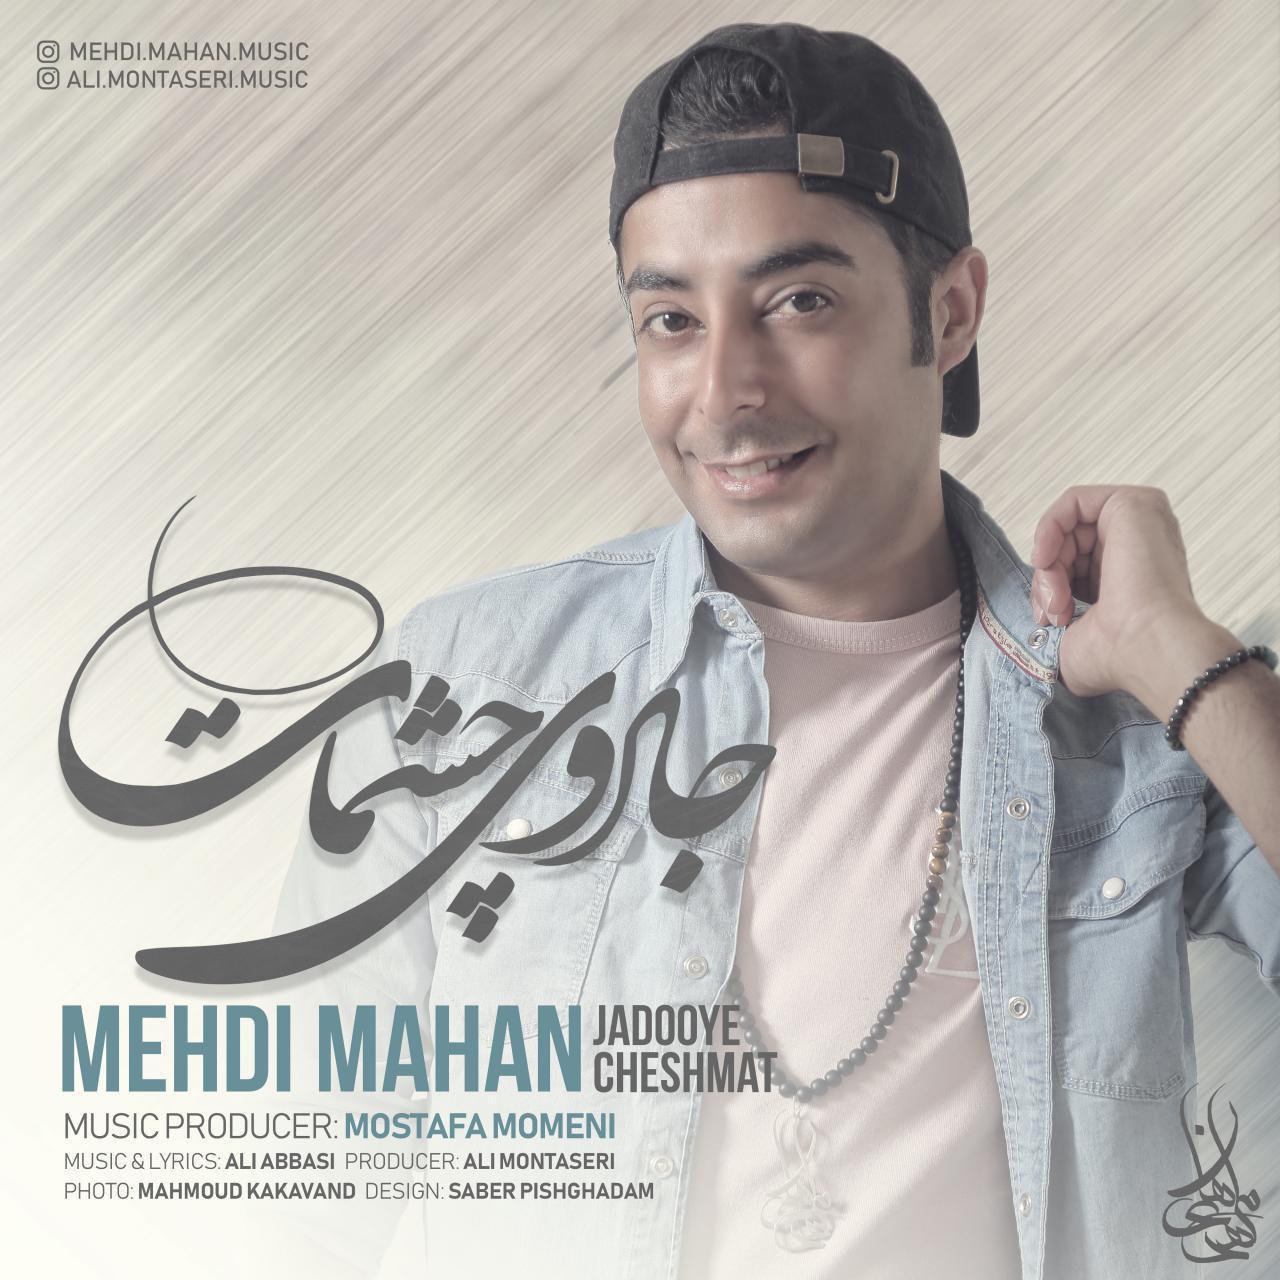 Mehdi Mahan – Jadooye Cheshmat